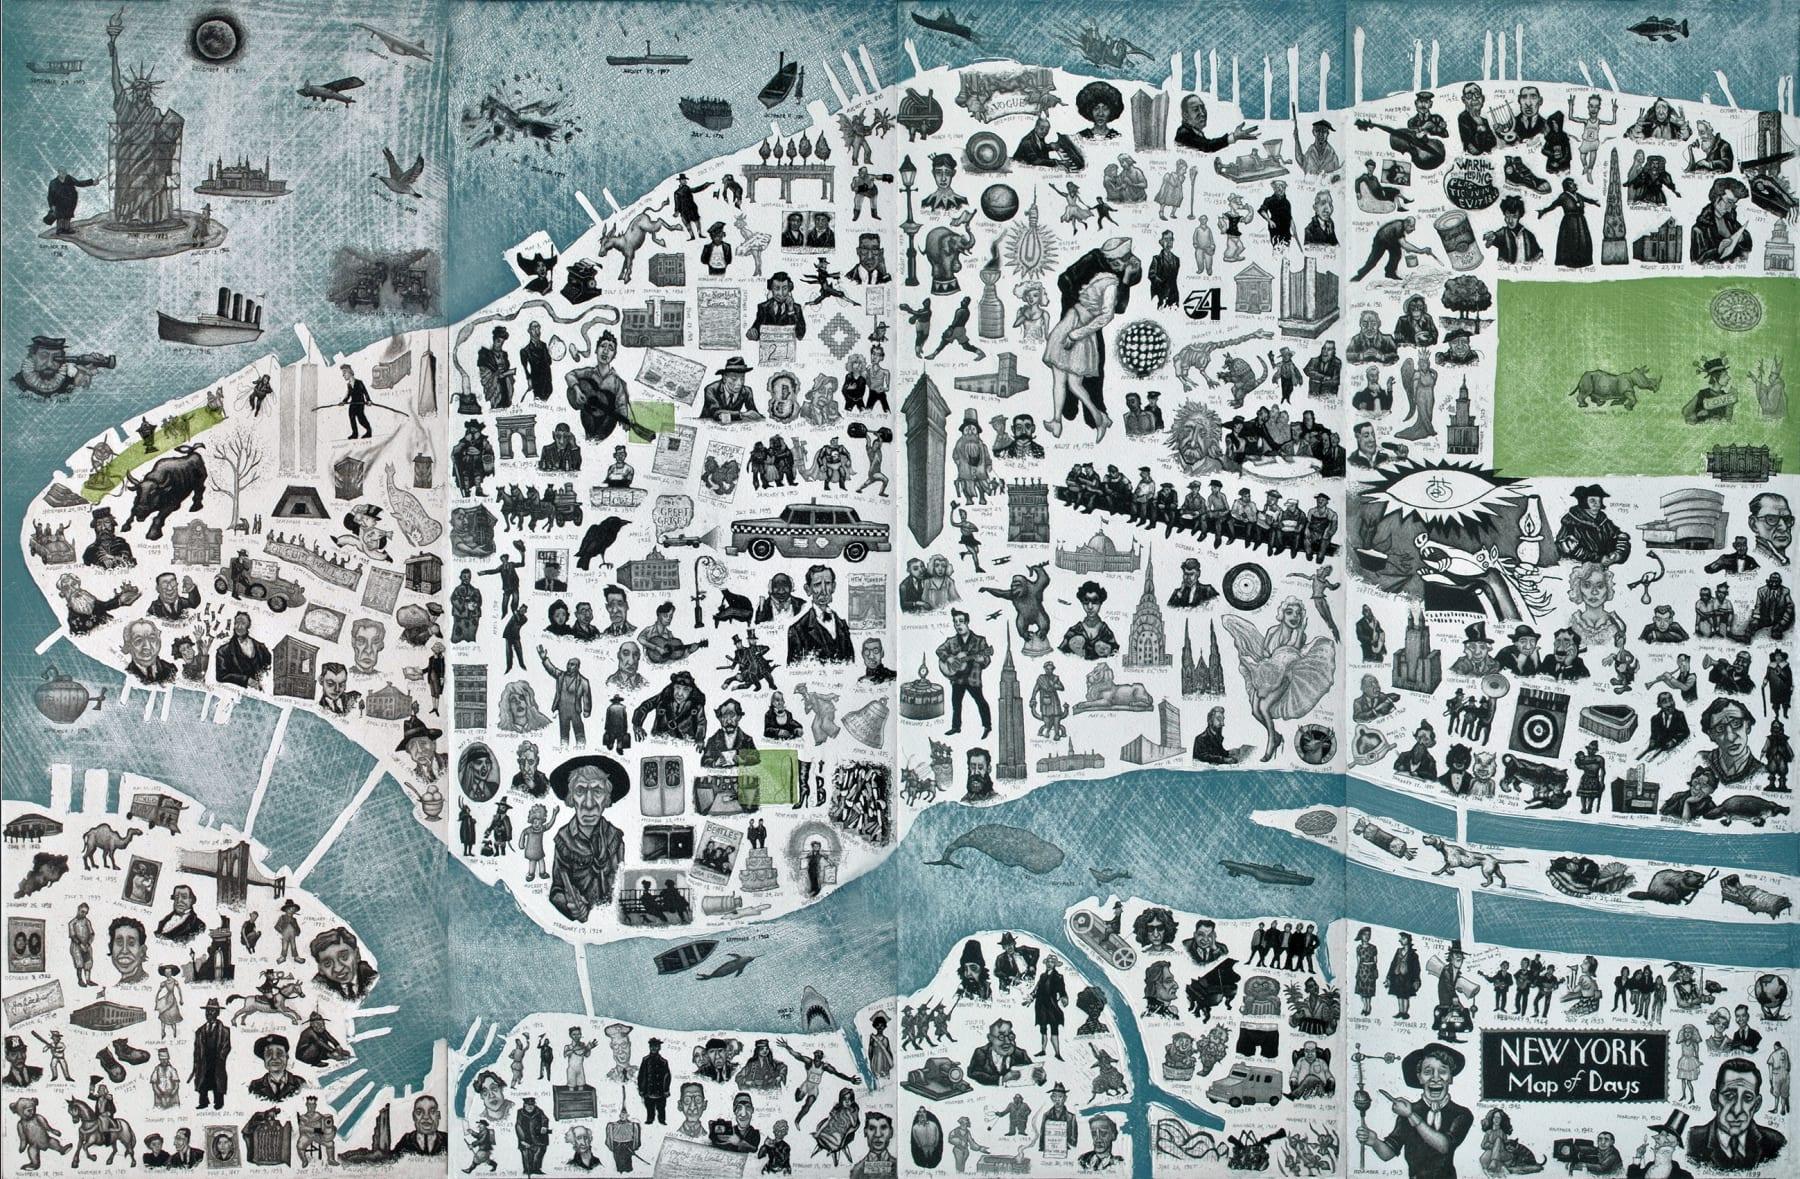 Mychael Barratt, New York Map of Days, 2017